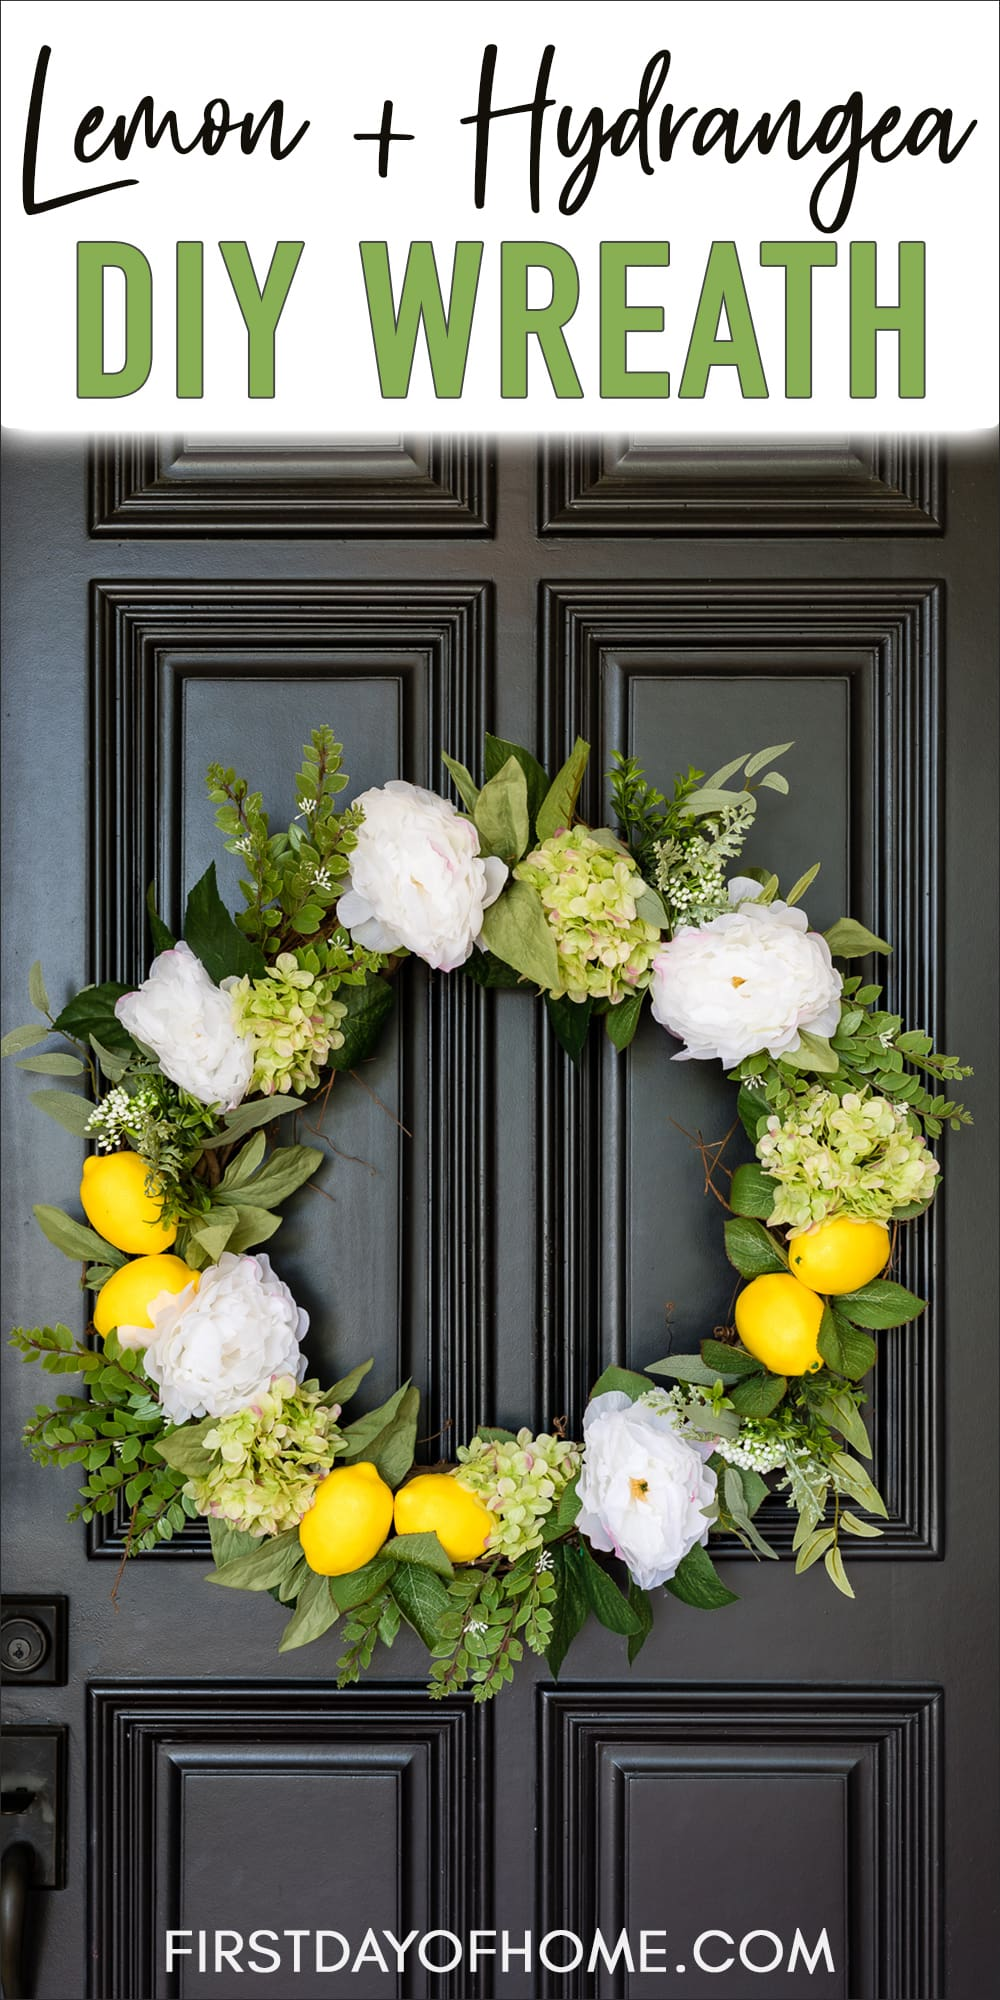 "Summer wreath with lemons, hydrangeas, and white peonies with text overlay reading ""Lemon + Hydrangea DIY Wreath"""